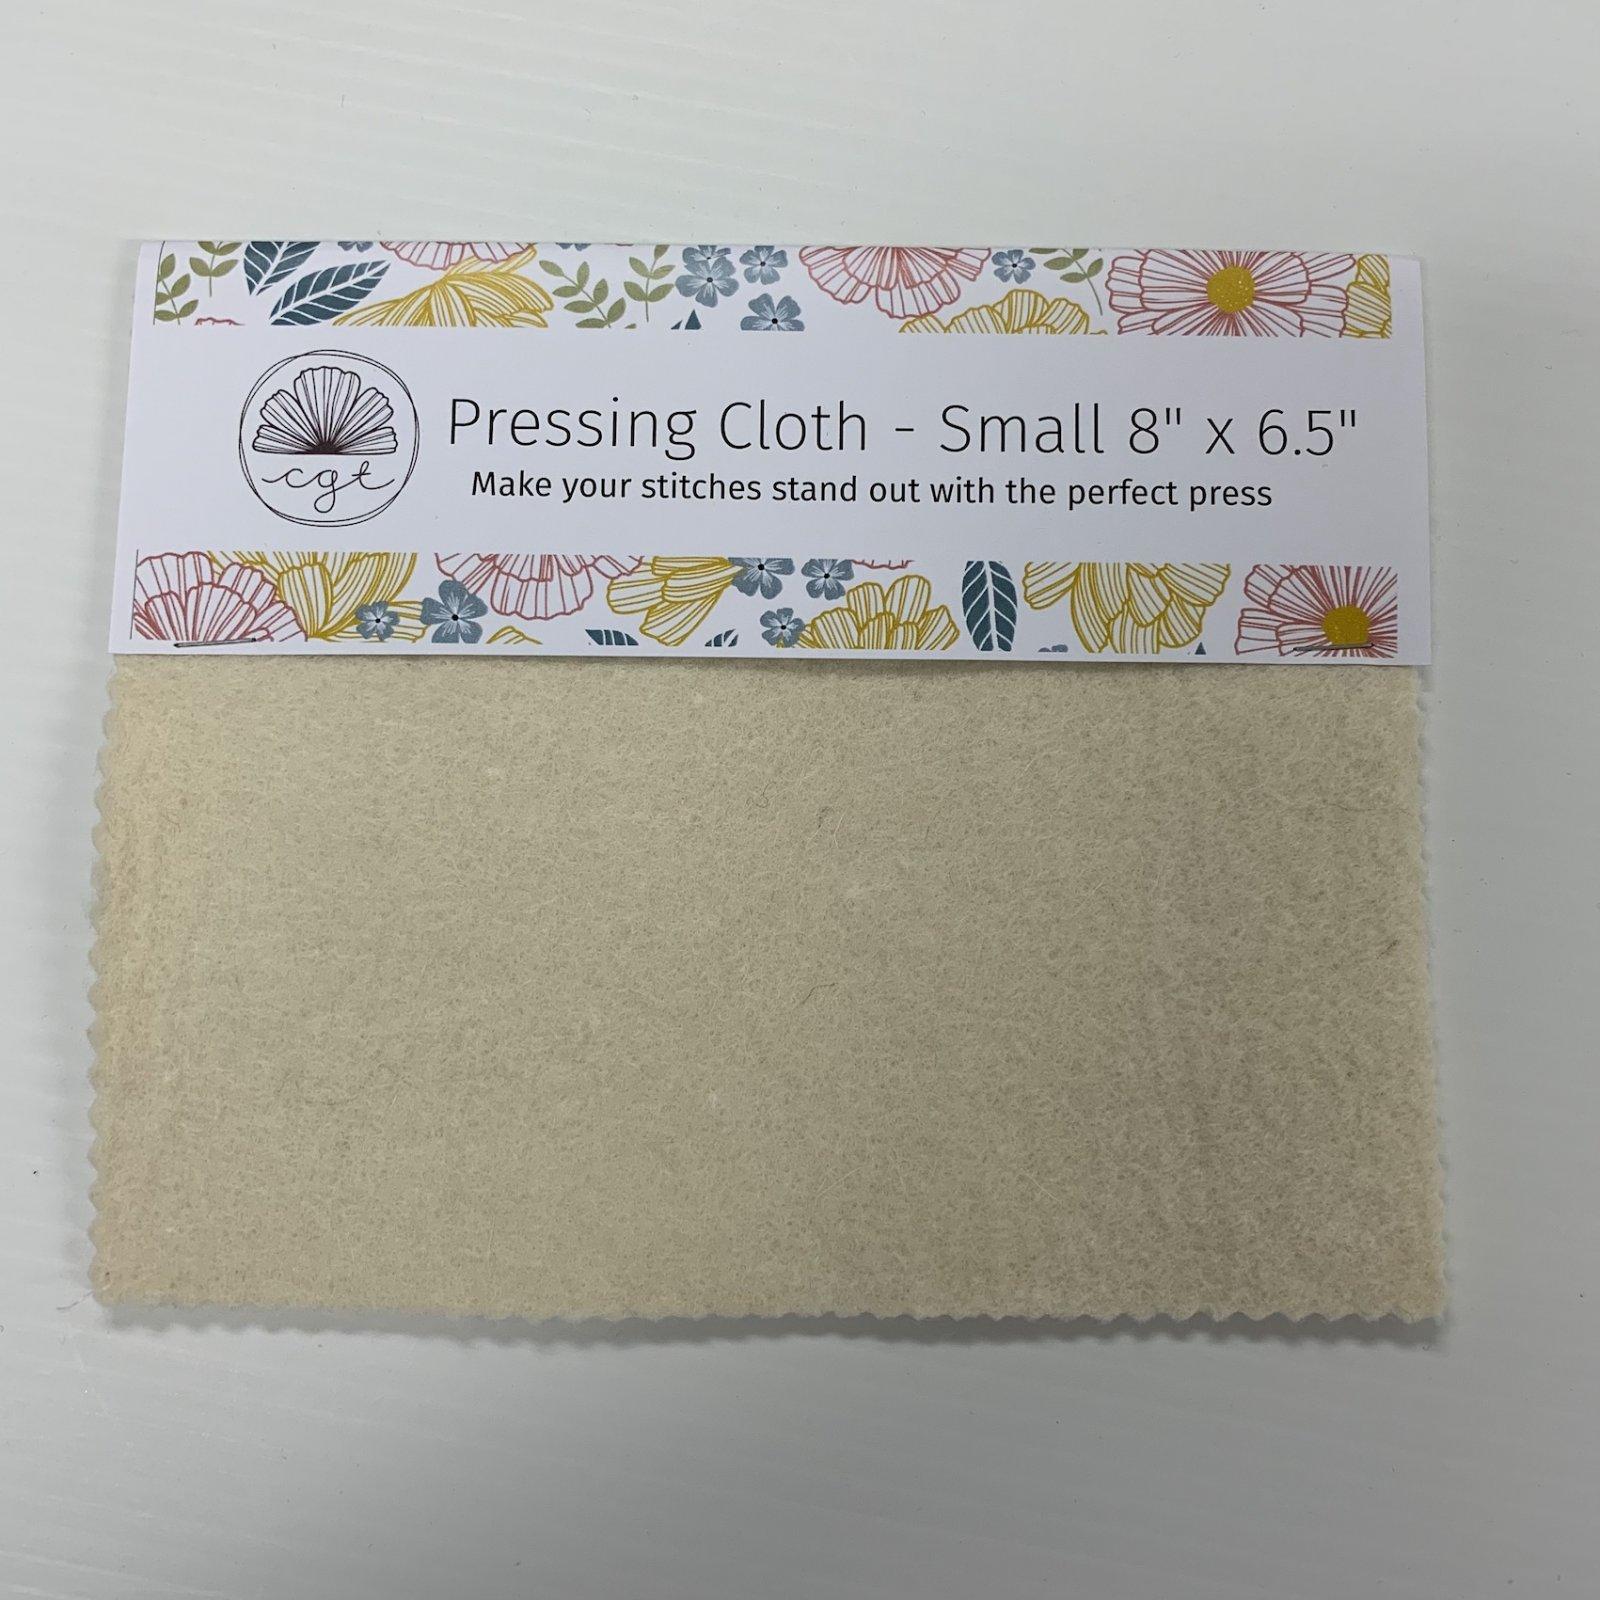 Pressing Cloth Small 8 X 6.5